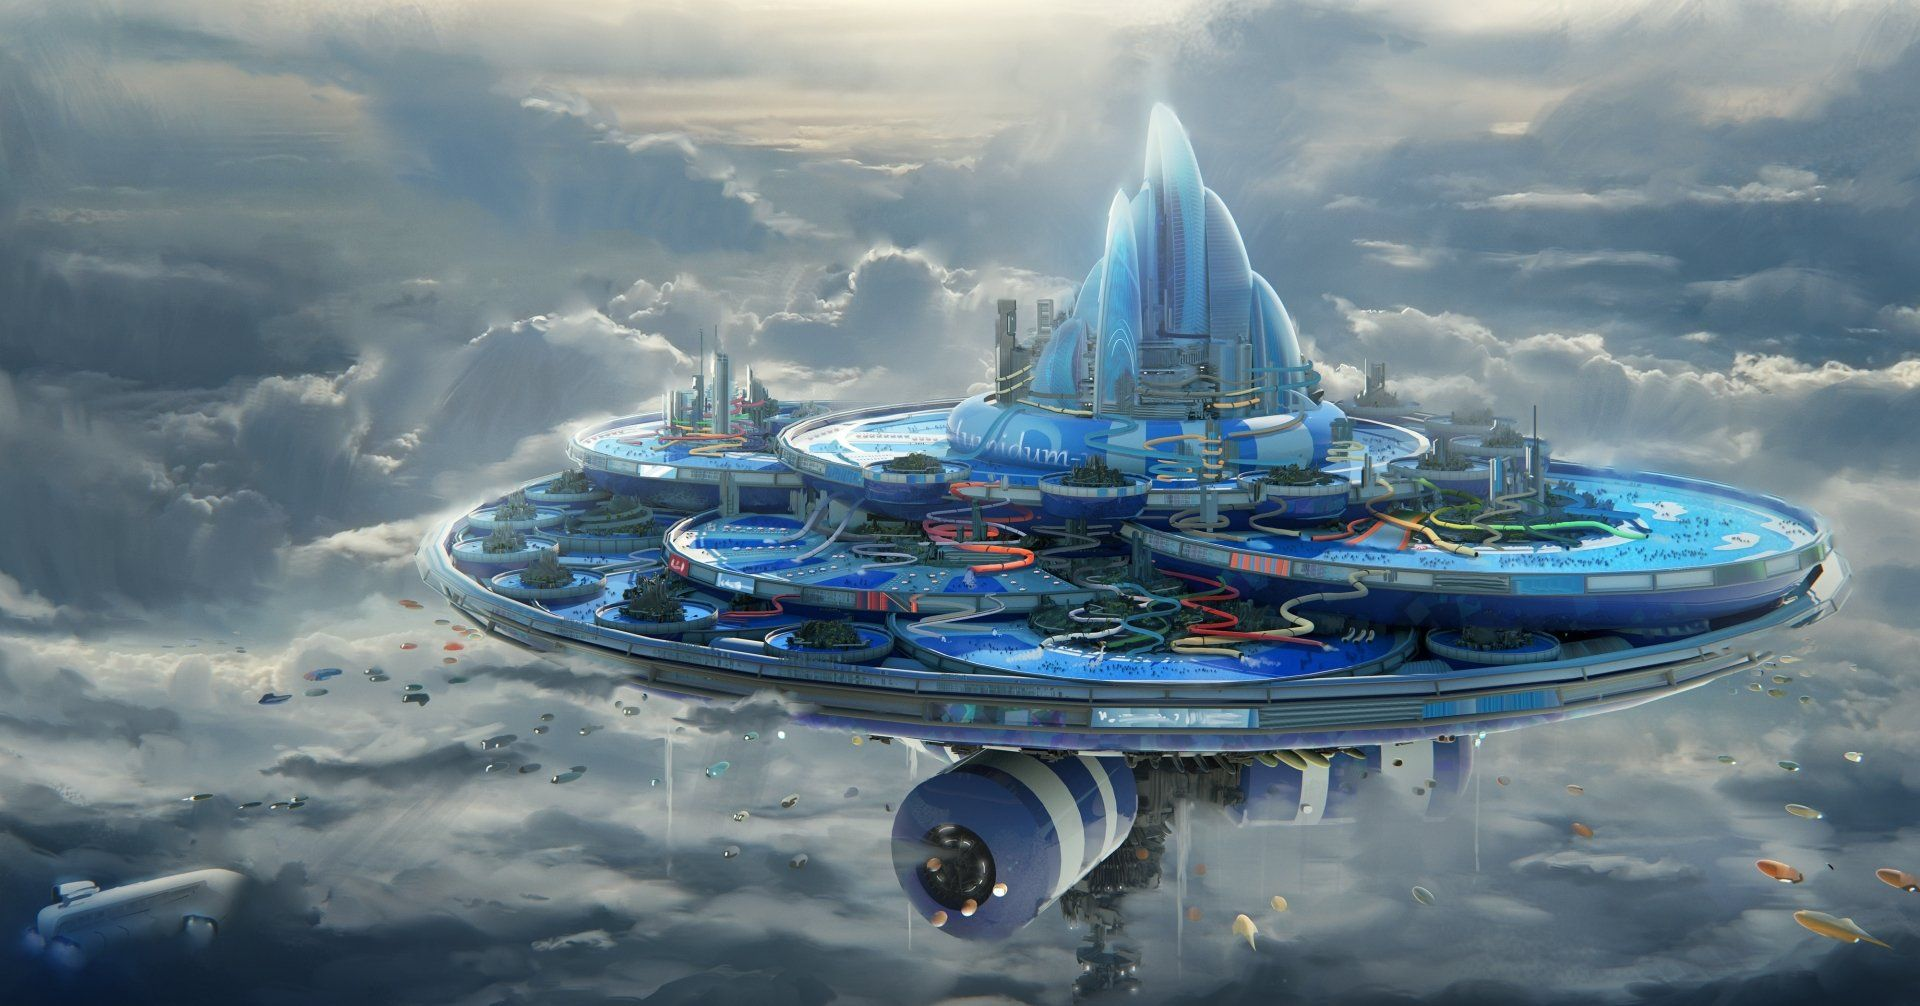 Sci Fi City Floating Island Cloud Aircraft Futuristic Wallpaper Sci Fi City Sci Fi Wallpaper Futuristic City